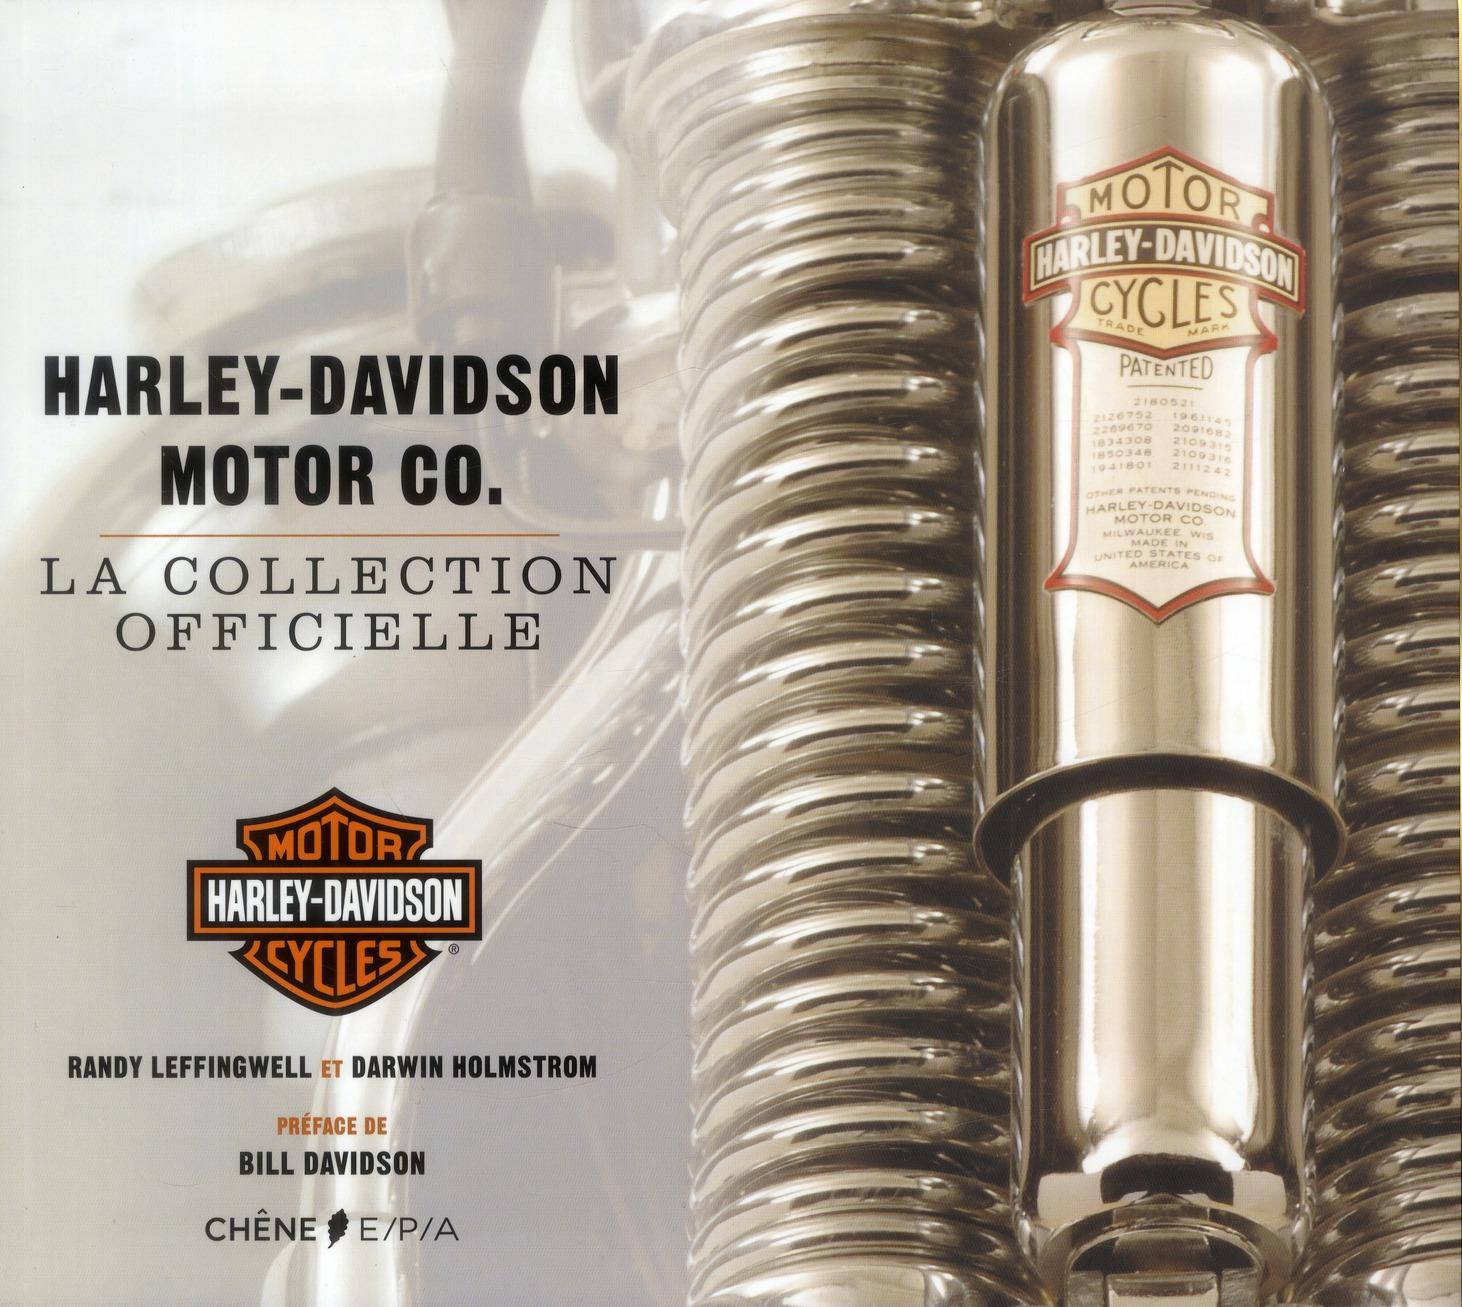 Harley-Davidson Motor Co ; La Collection Officielle